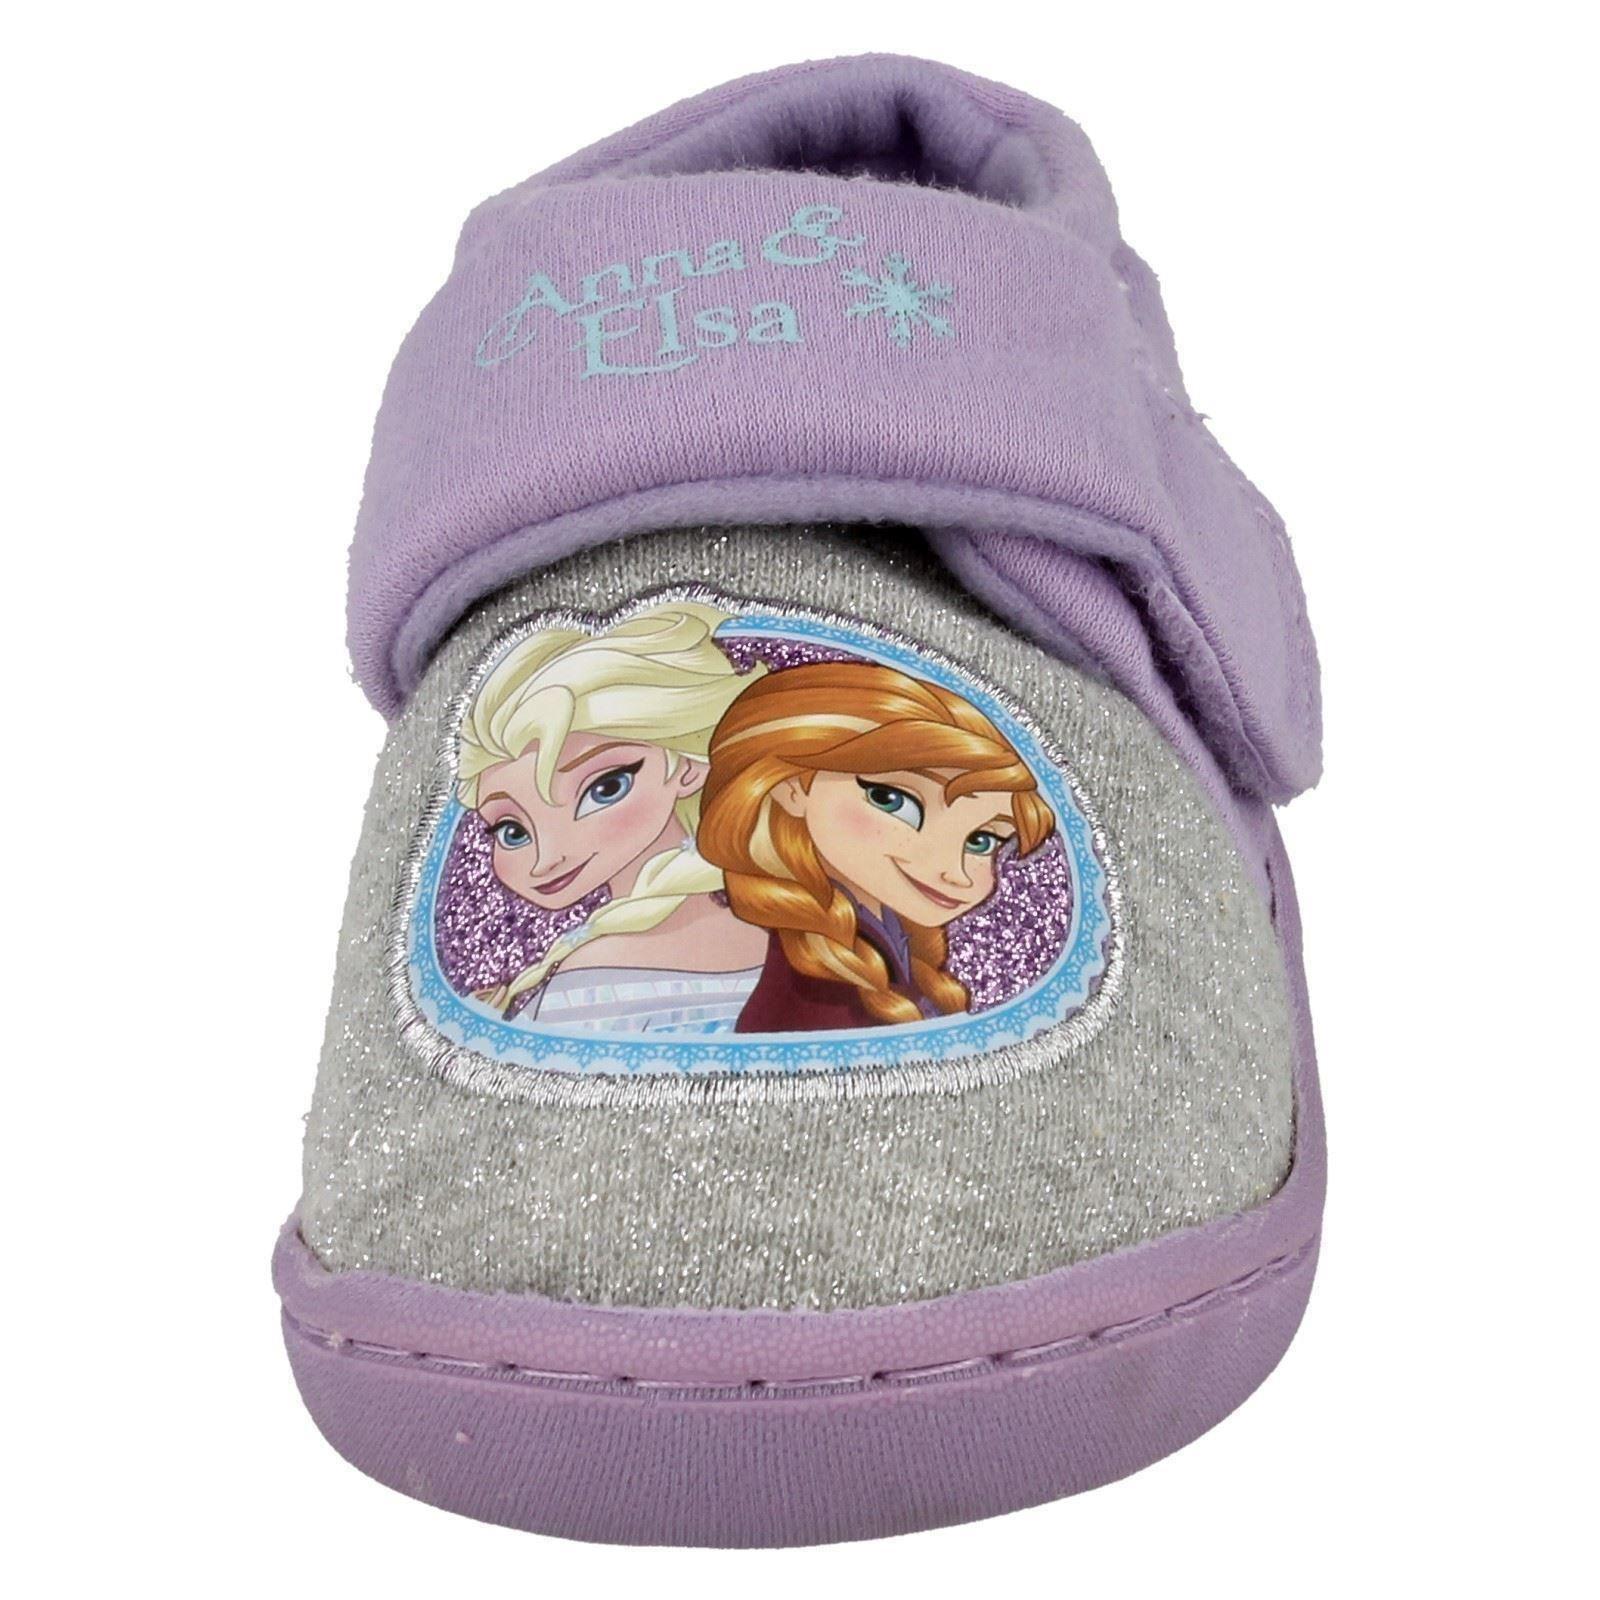 Chicas Personaje Disney Frozen Paradise Slipper